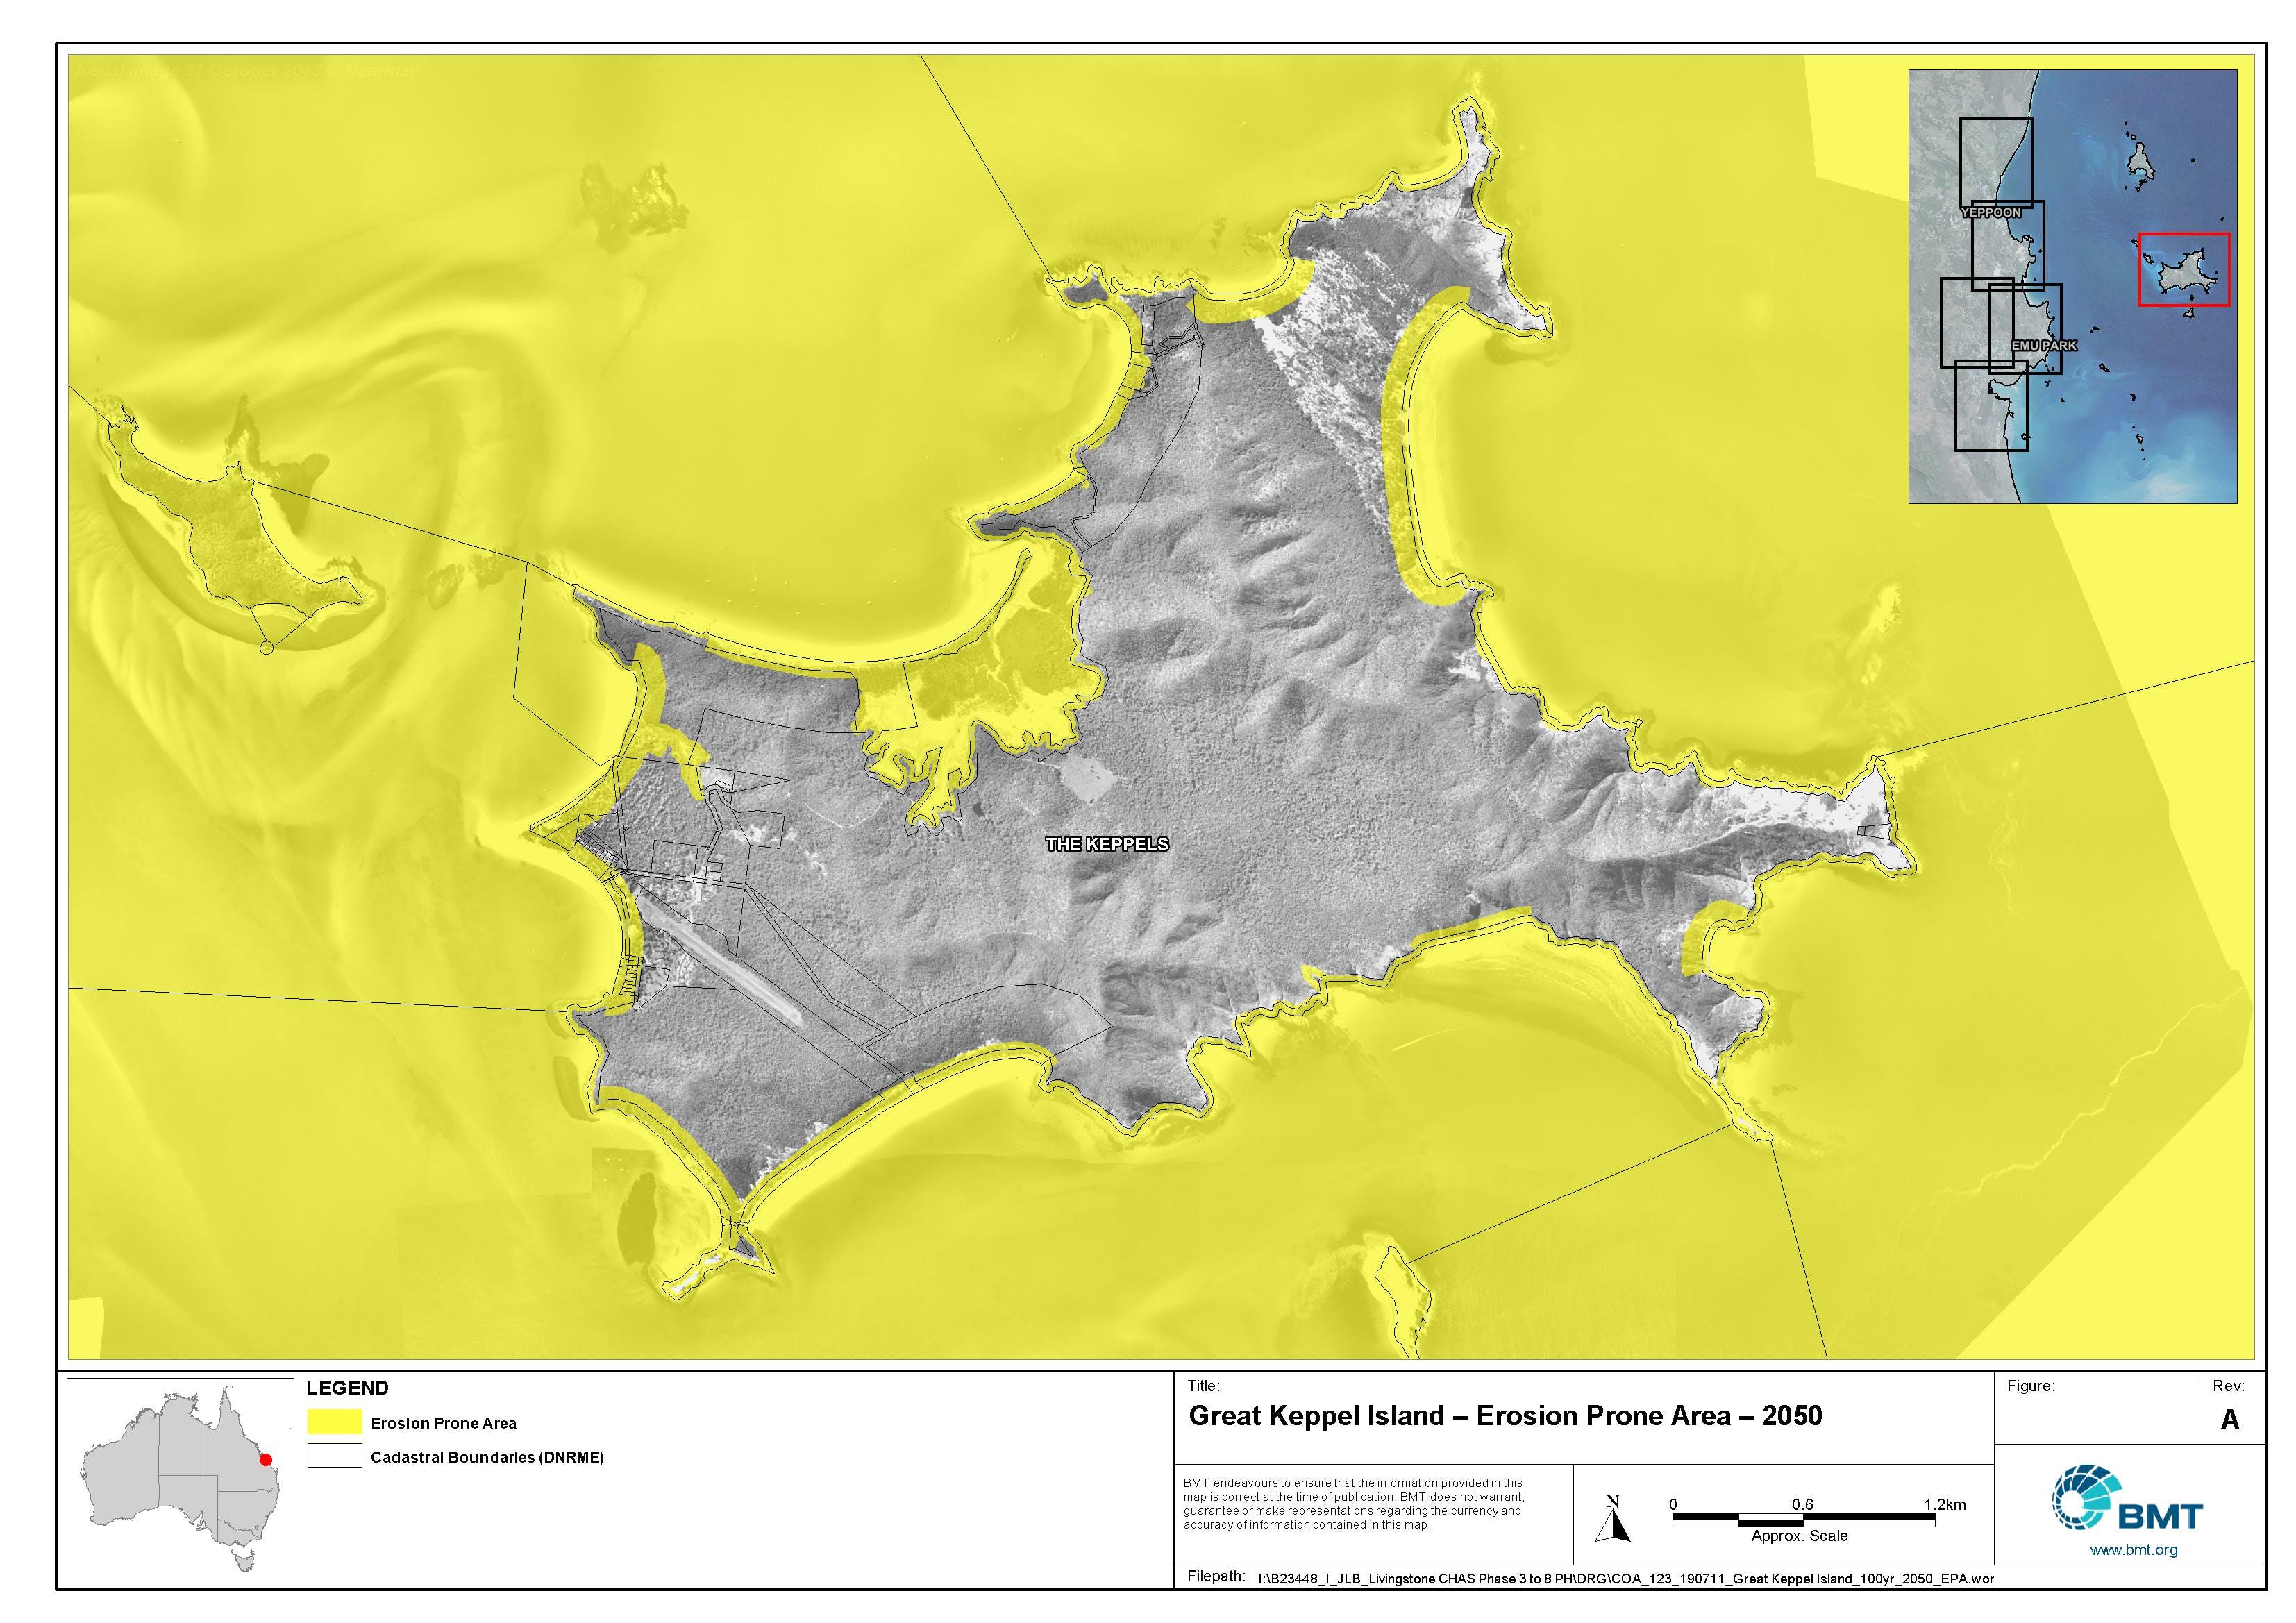 COA_123_190711_Great Keppel Island_100yr_2050_EPA.jpg